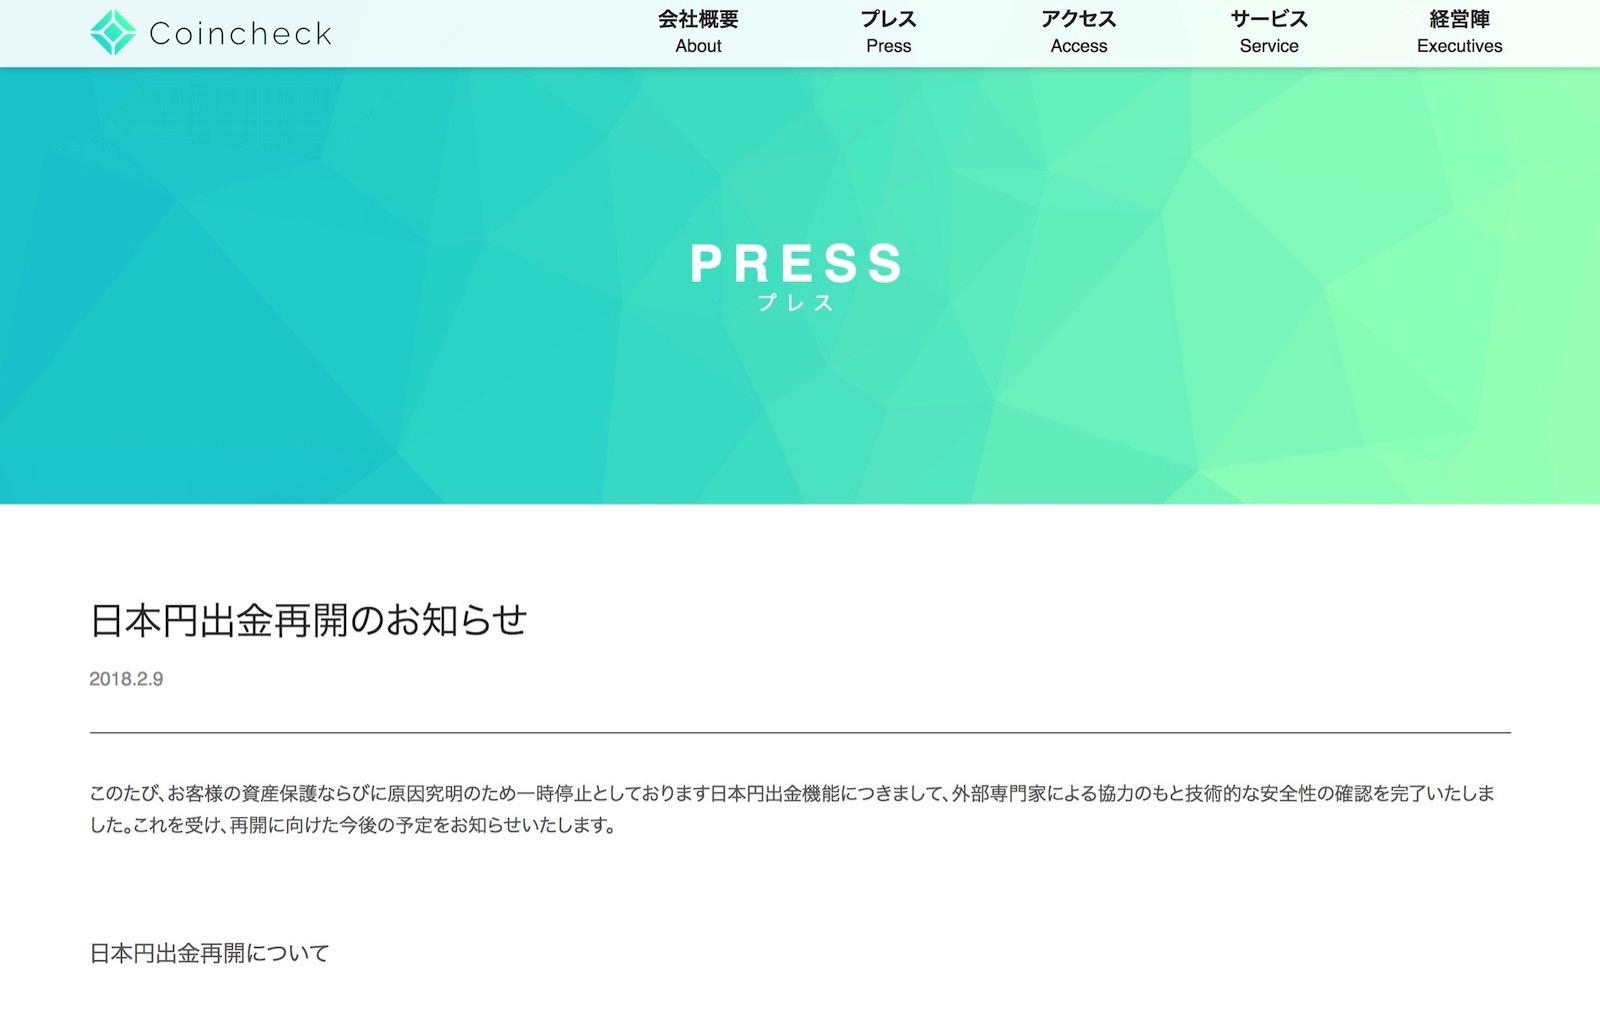 Coincheck-Restart-of-JP-Yen.jpg